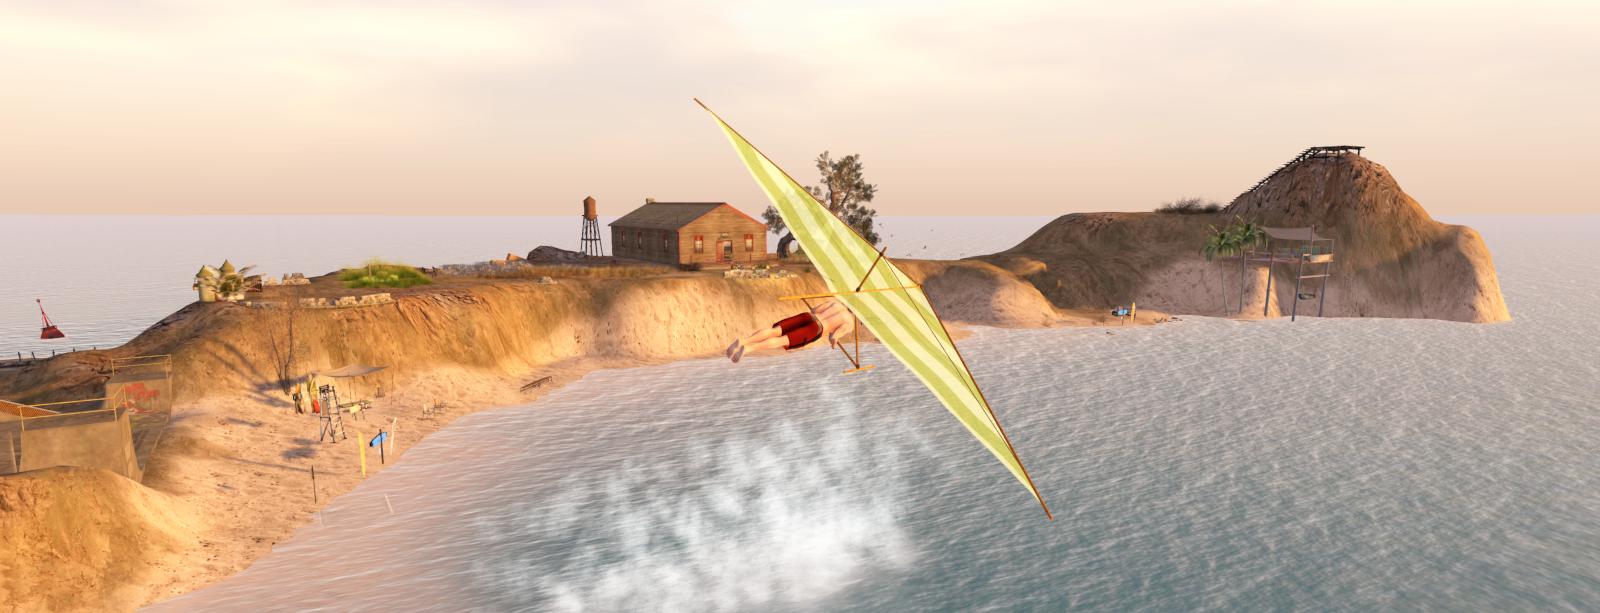 Ricco hang gliding